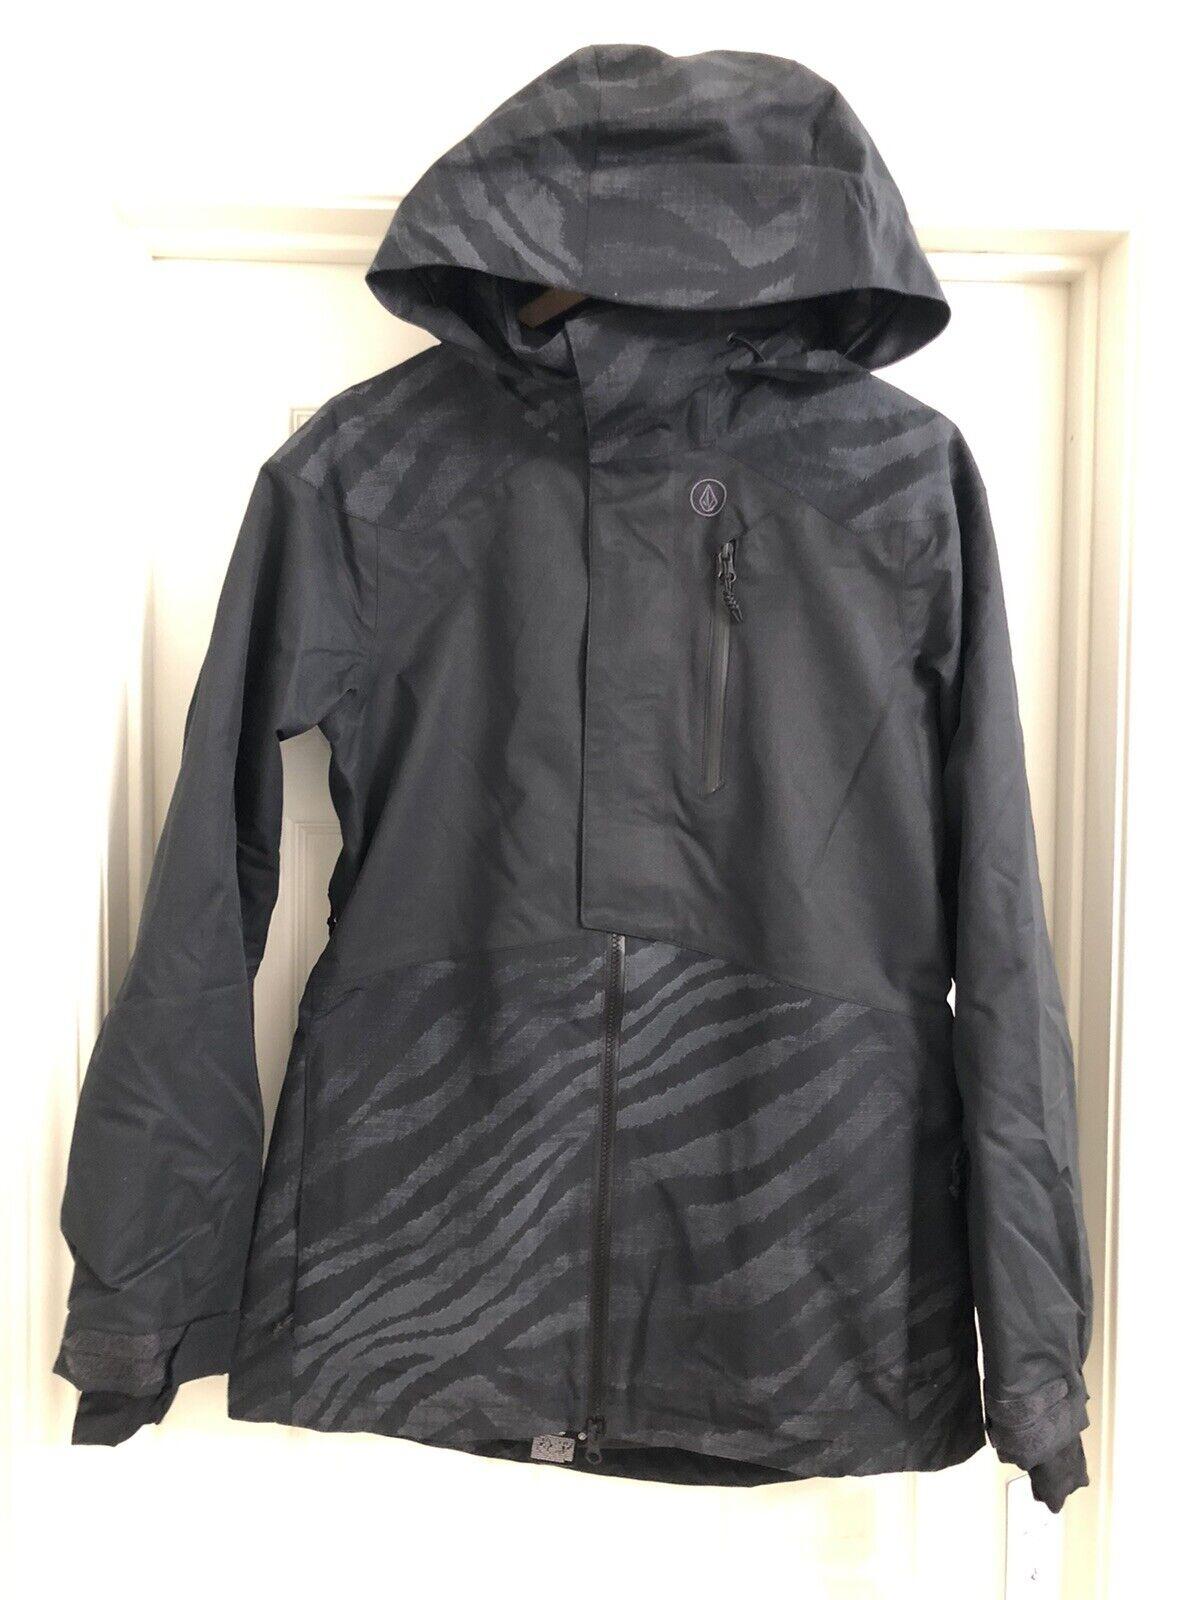 damen VOLCOM PINE 2L TDS SNOWBOARD JACKET schwarz ON schwarz SMALL S BRAND NEW  250